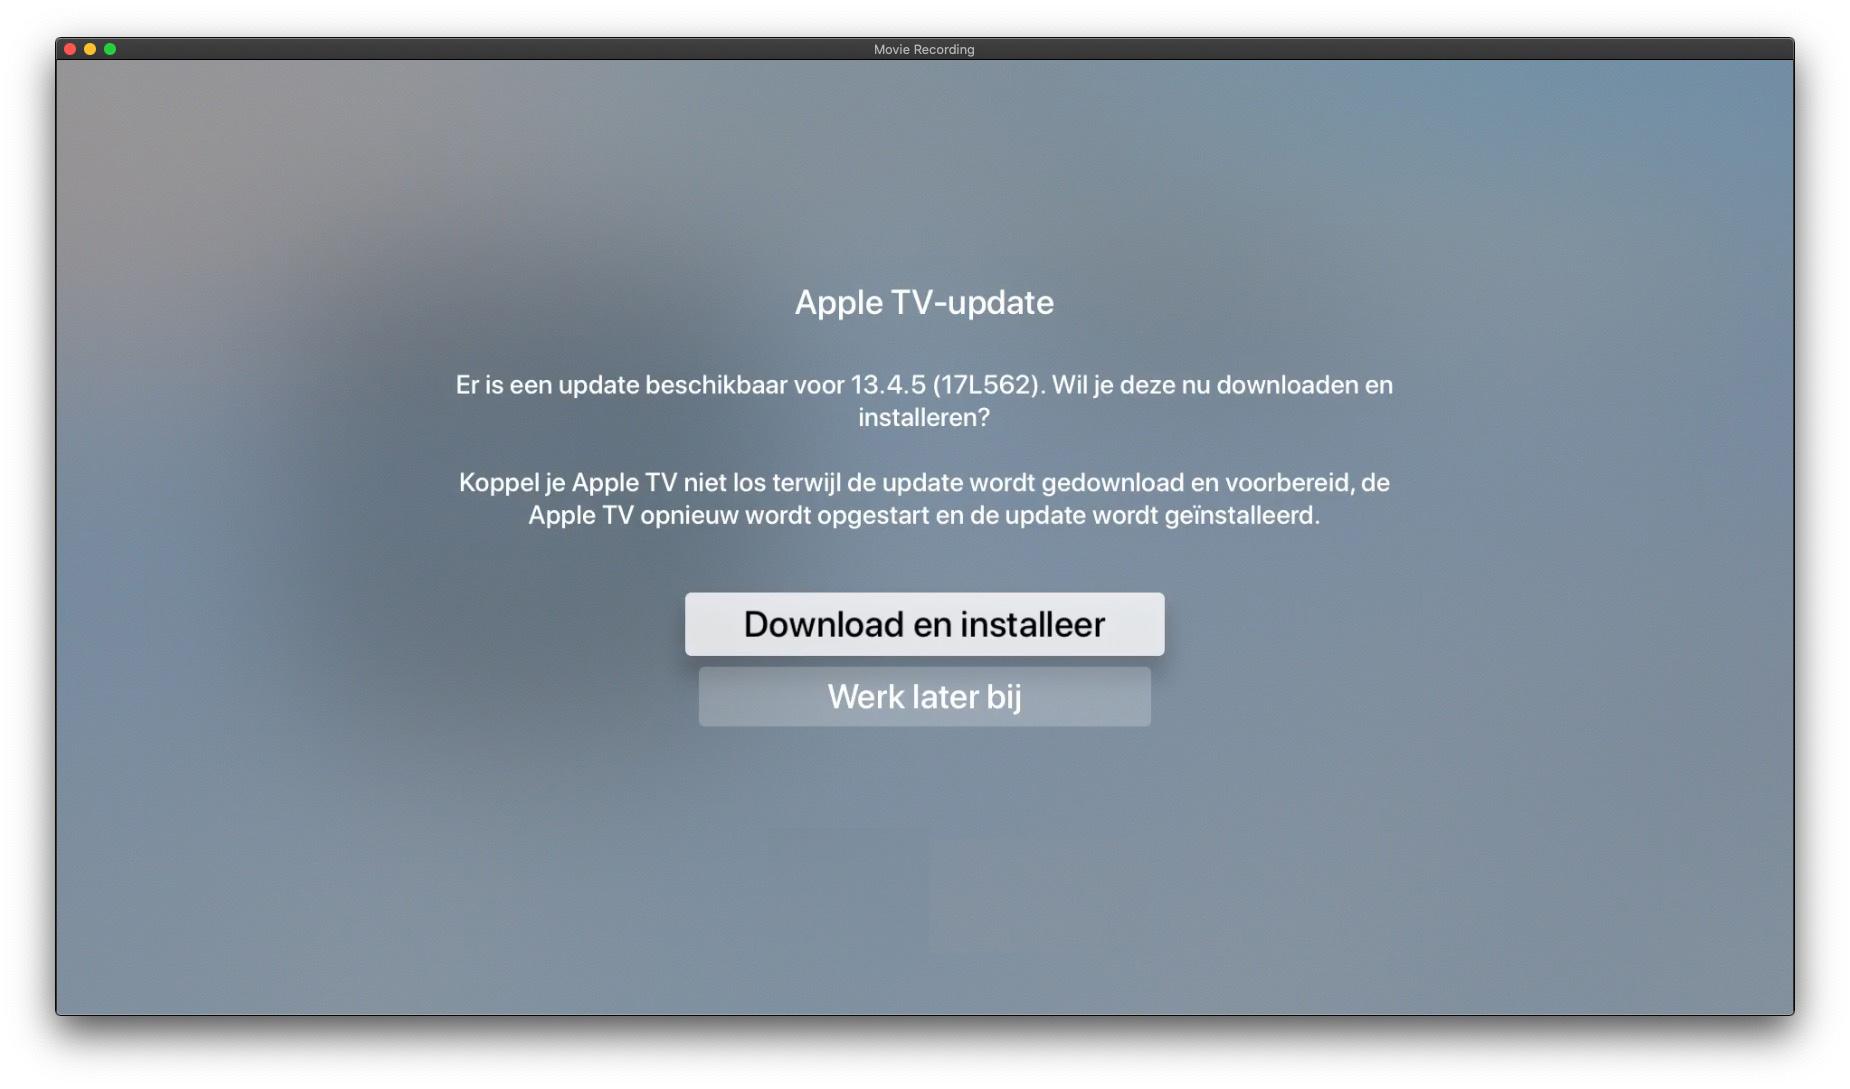 https://www.macfreak.nl/modules/news/images/zArt.tvOS13.4.5Update.jpg